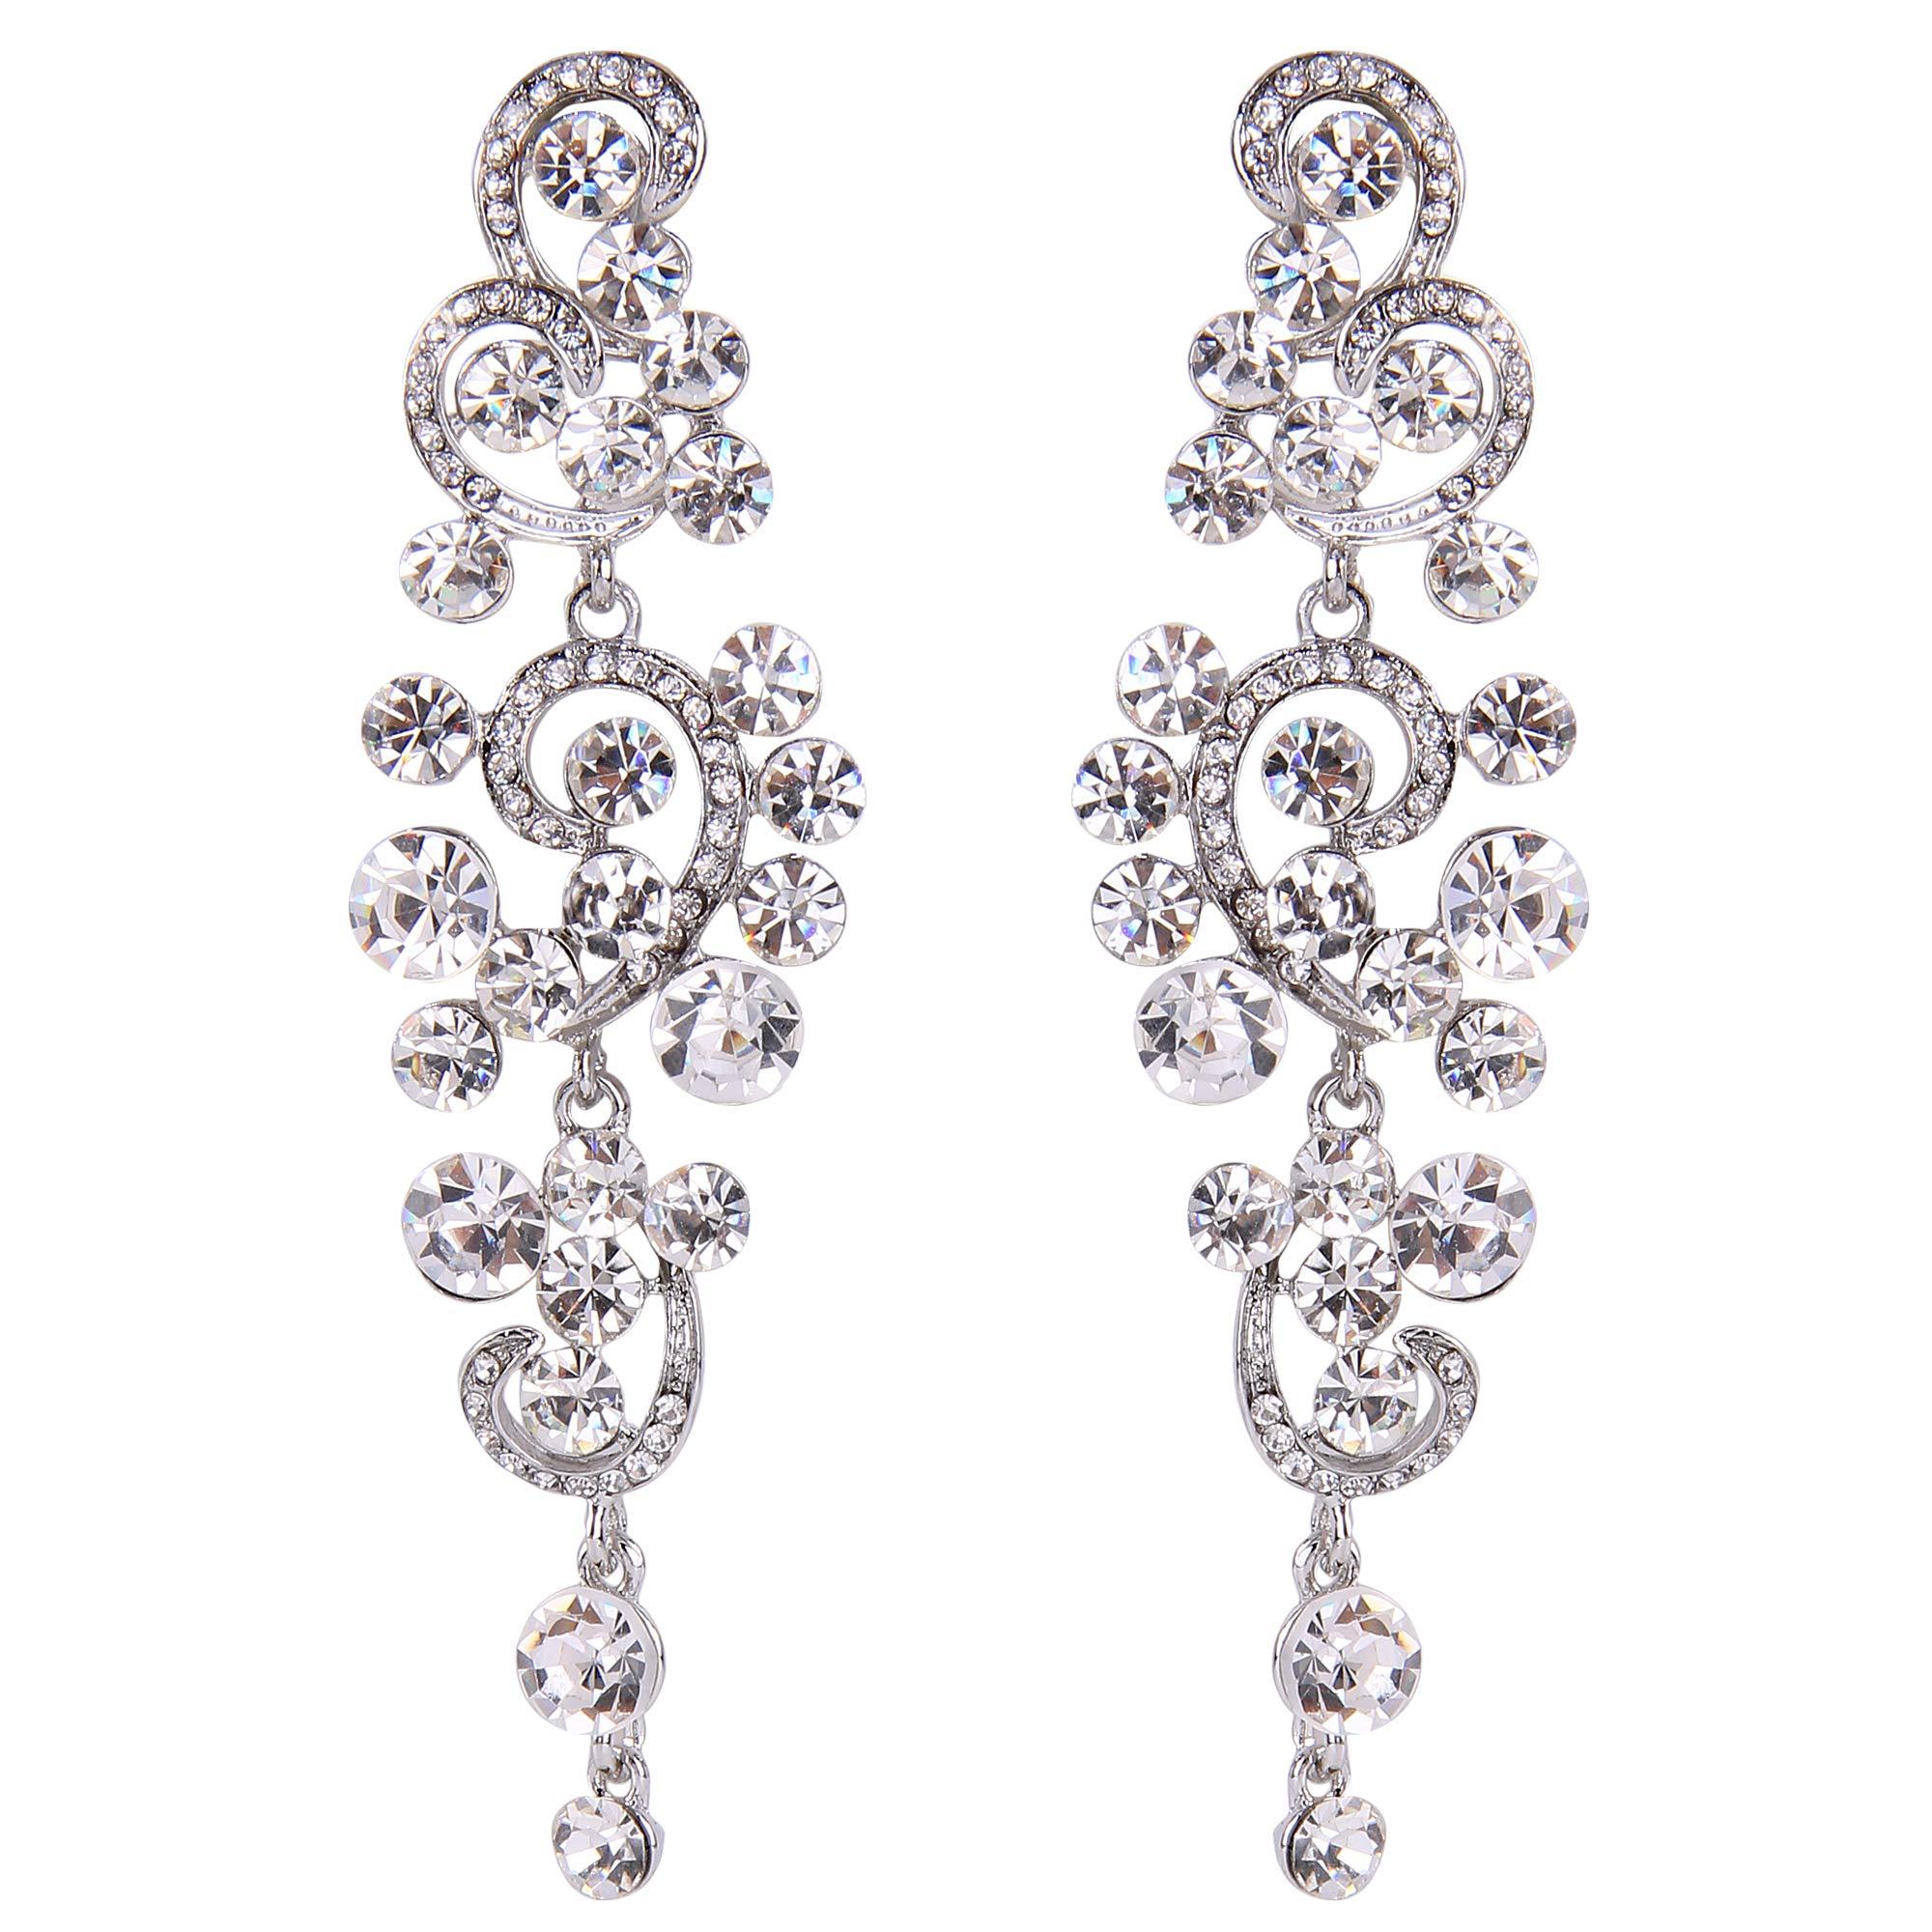 BriLove Silver-Tone Dangle Earrings for Women Wedding Bridal Bohemian Boho Crystal Floral Chandelier Hollow Earrings Clear